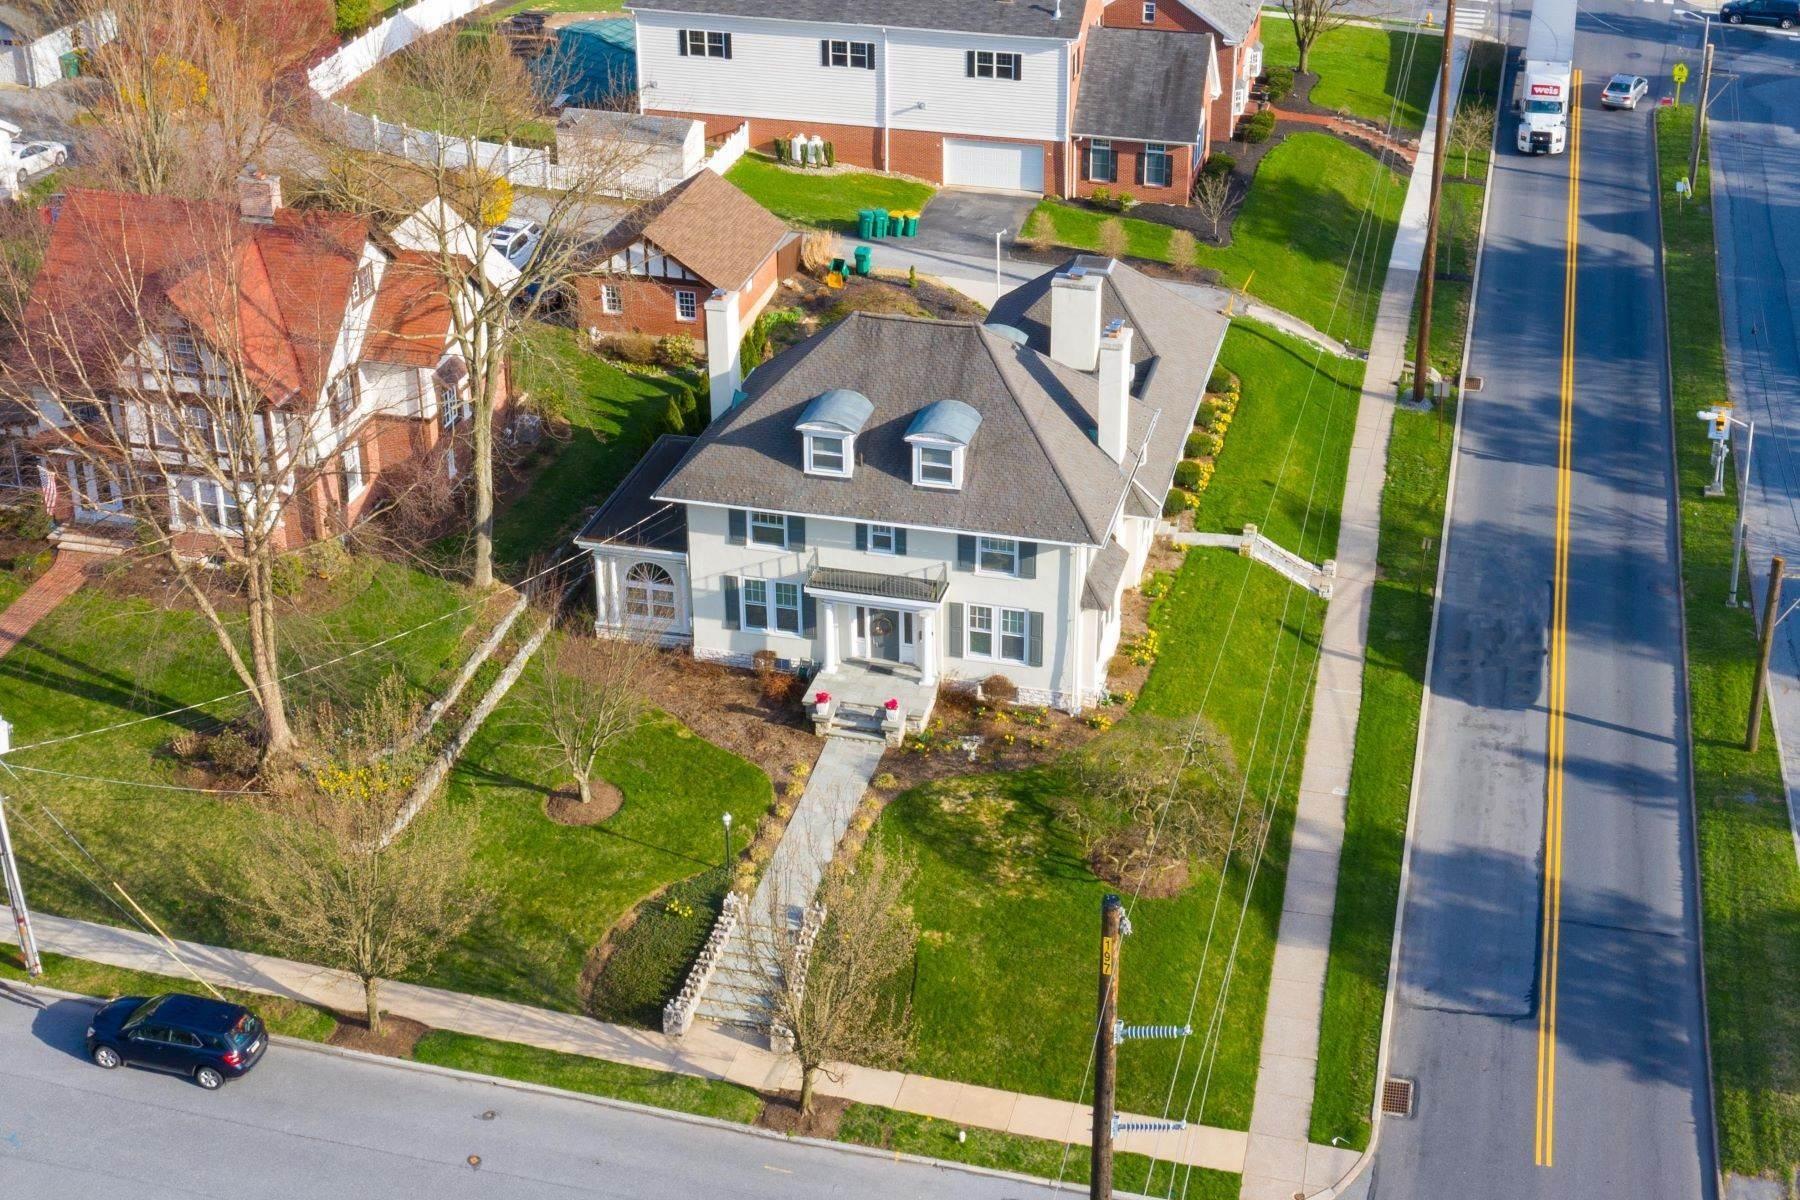 Single Family Homes for Sale at 206 E Granada Ave Hershey, Pennsylvania 17033 United States